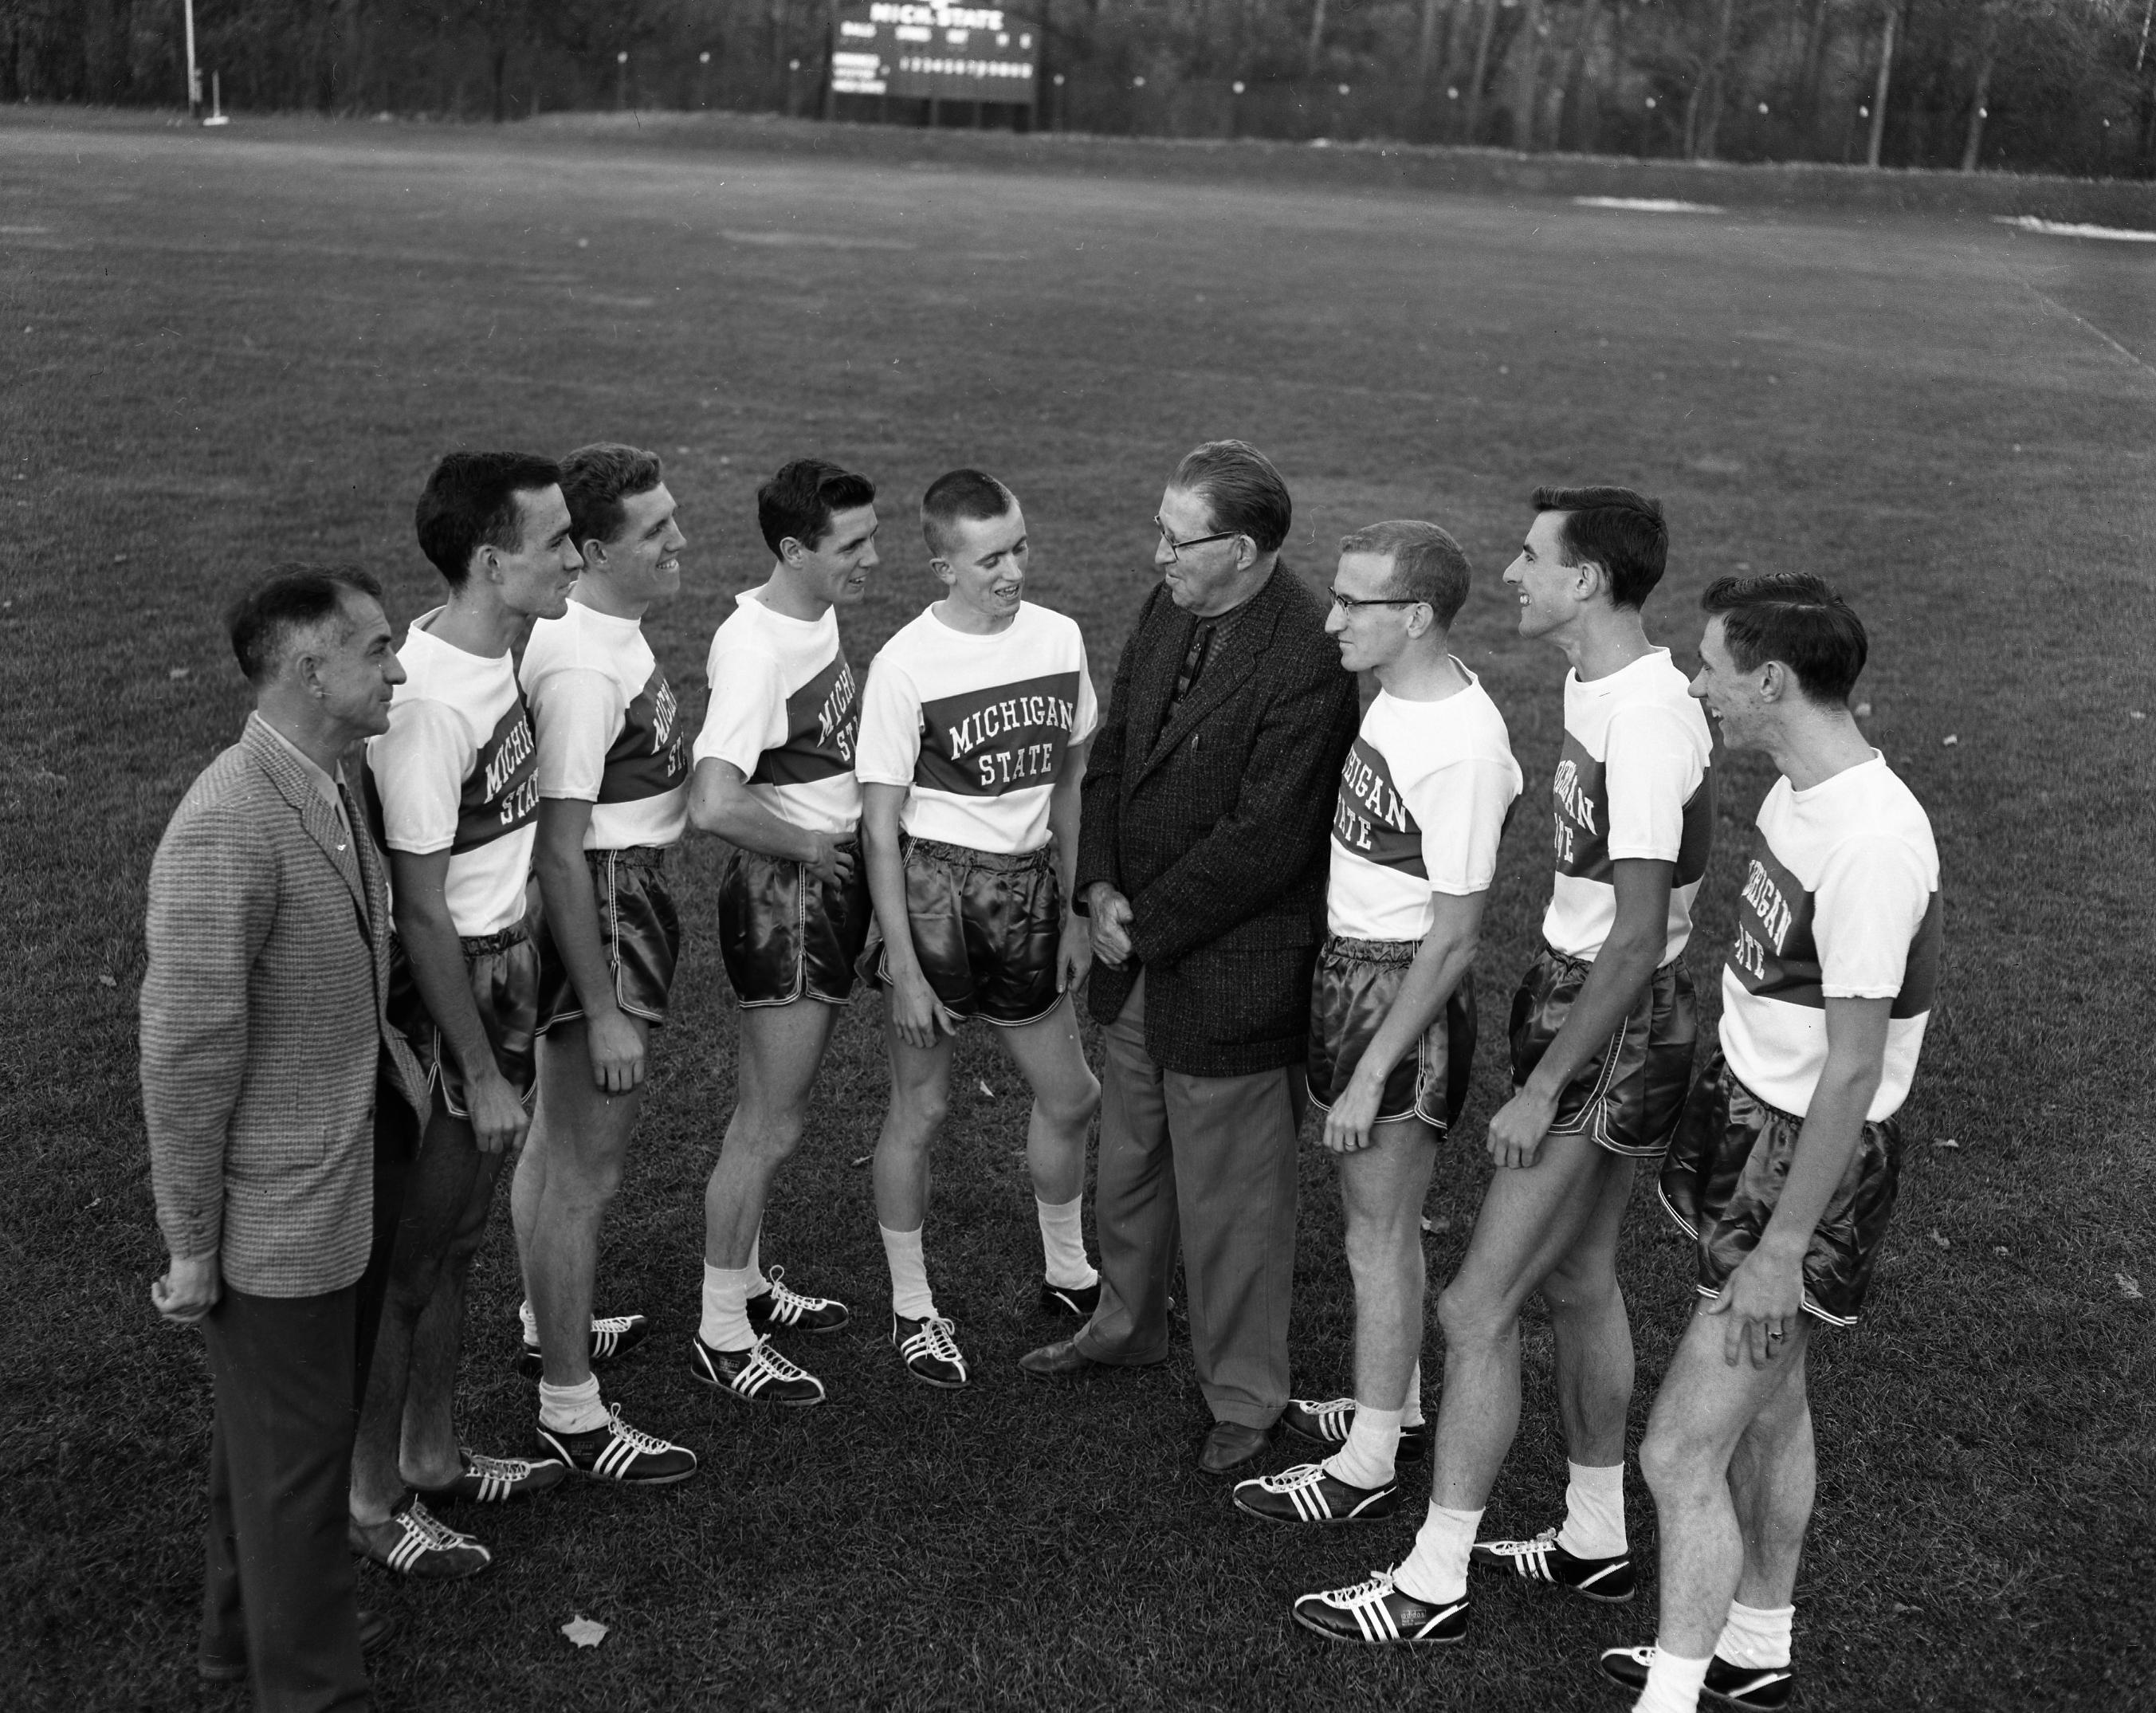 Cross Country Team, 1957